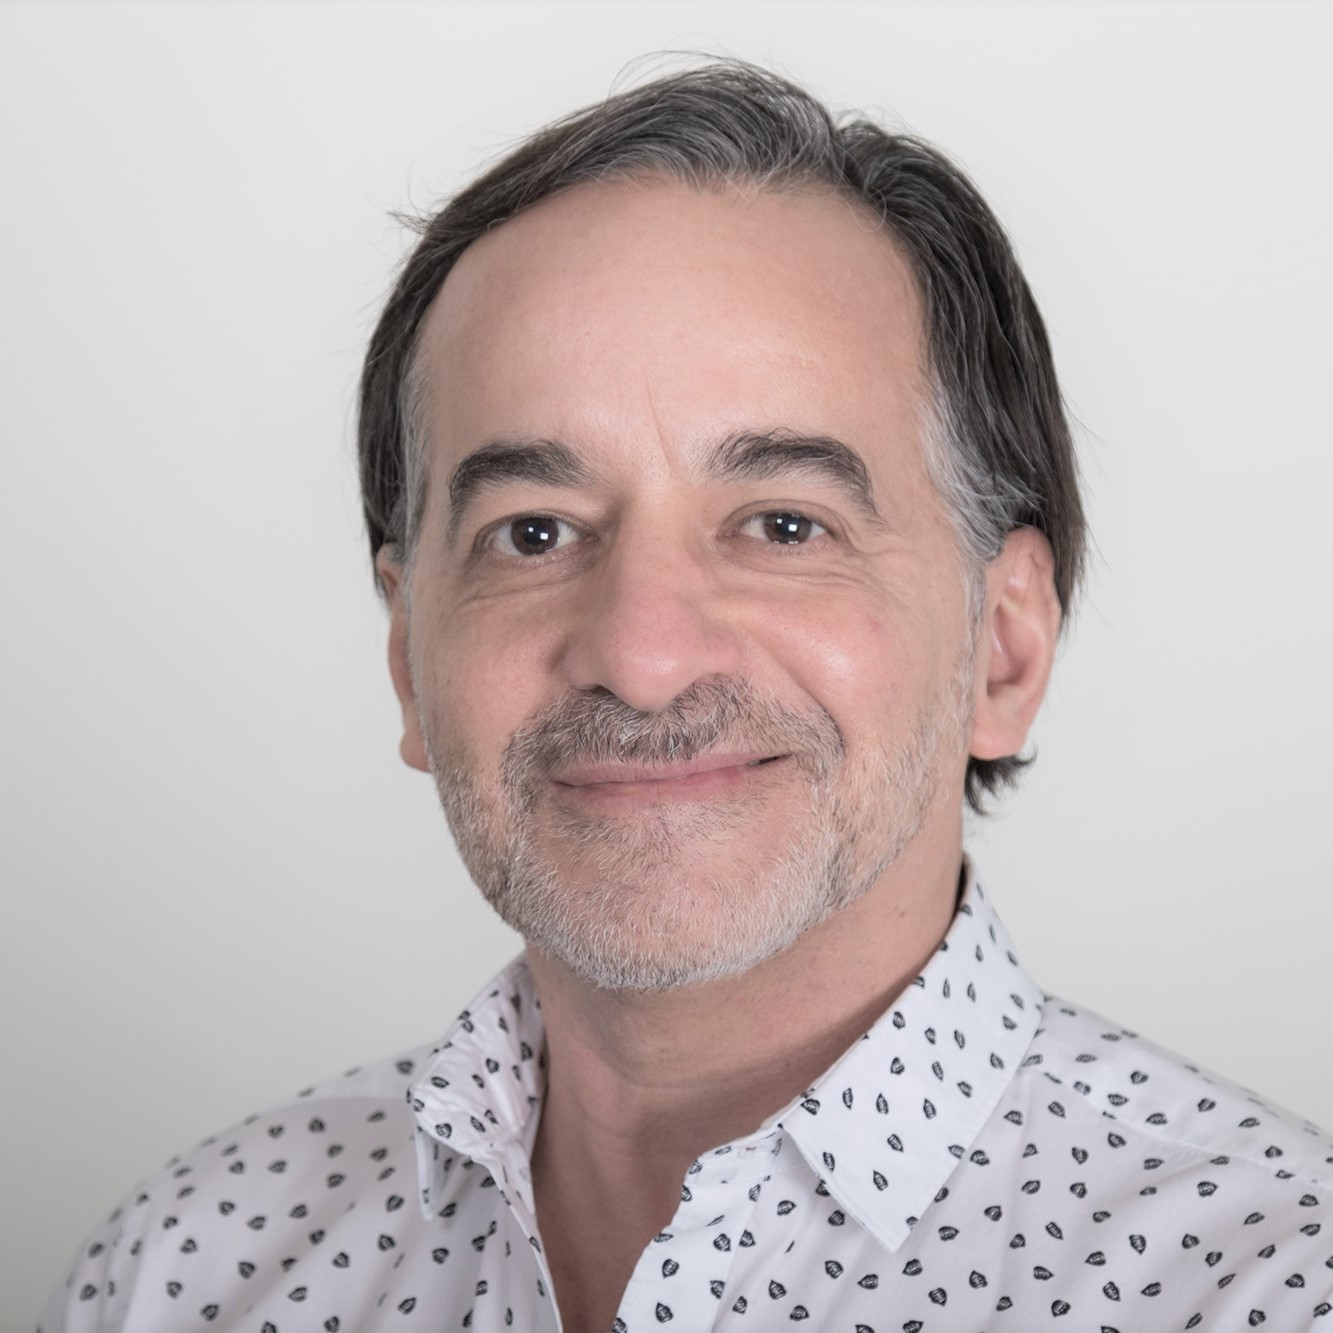 Edesio Miranda-Barbosa